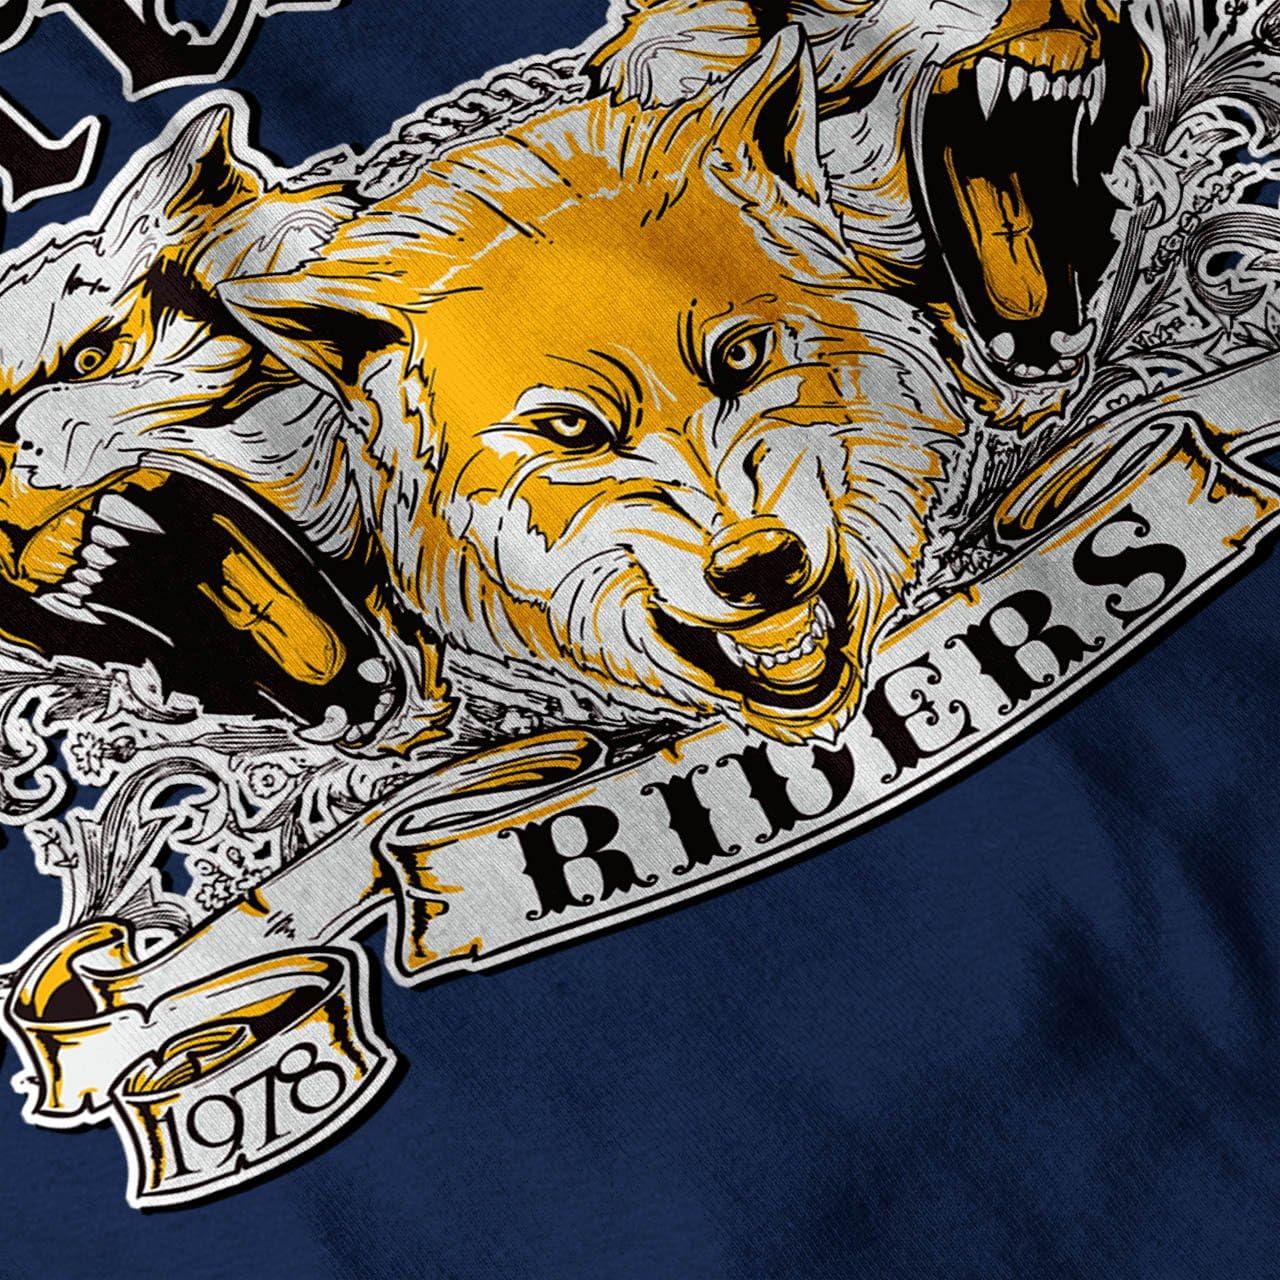 Wellcoda Werewolves Riders Biker Mens Tank Top Biker Fit Lifestyle Sports Shirt